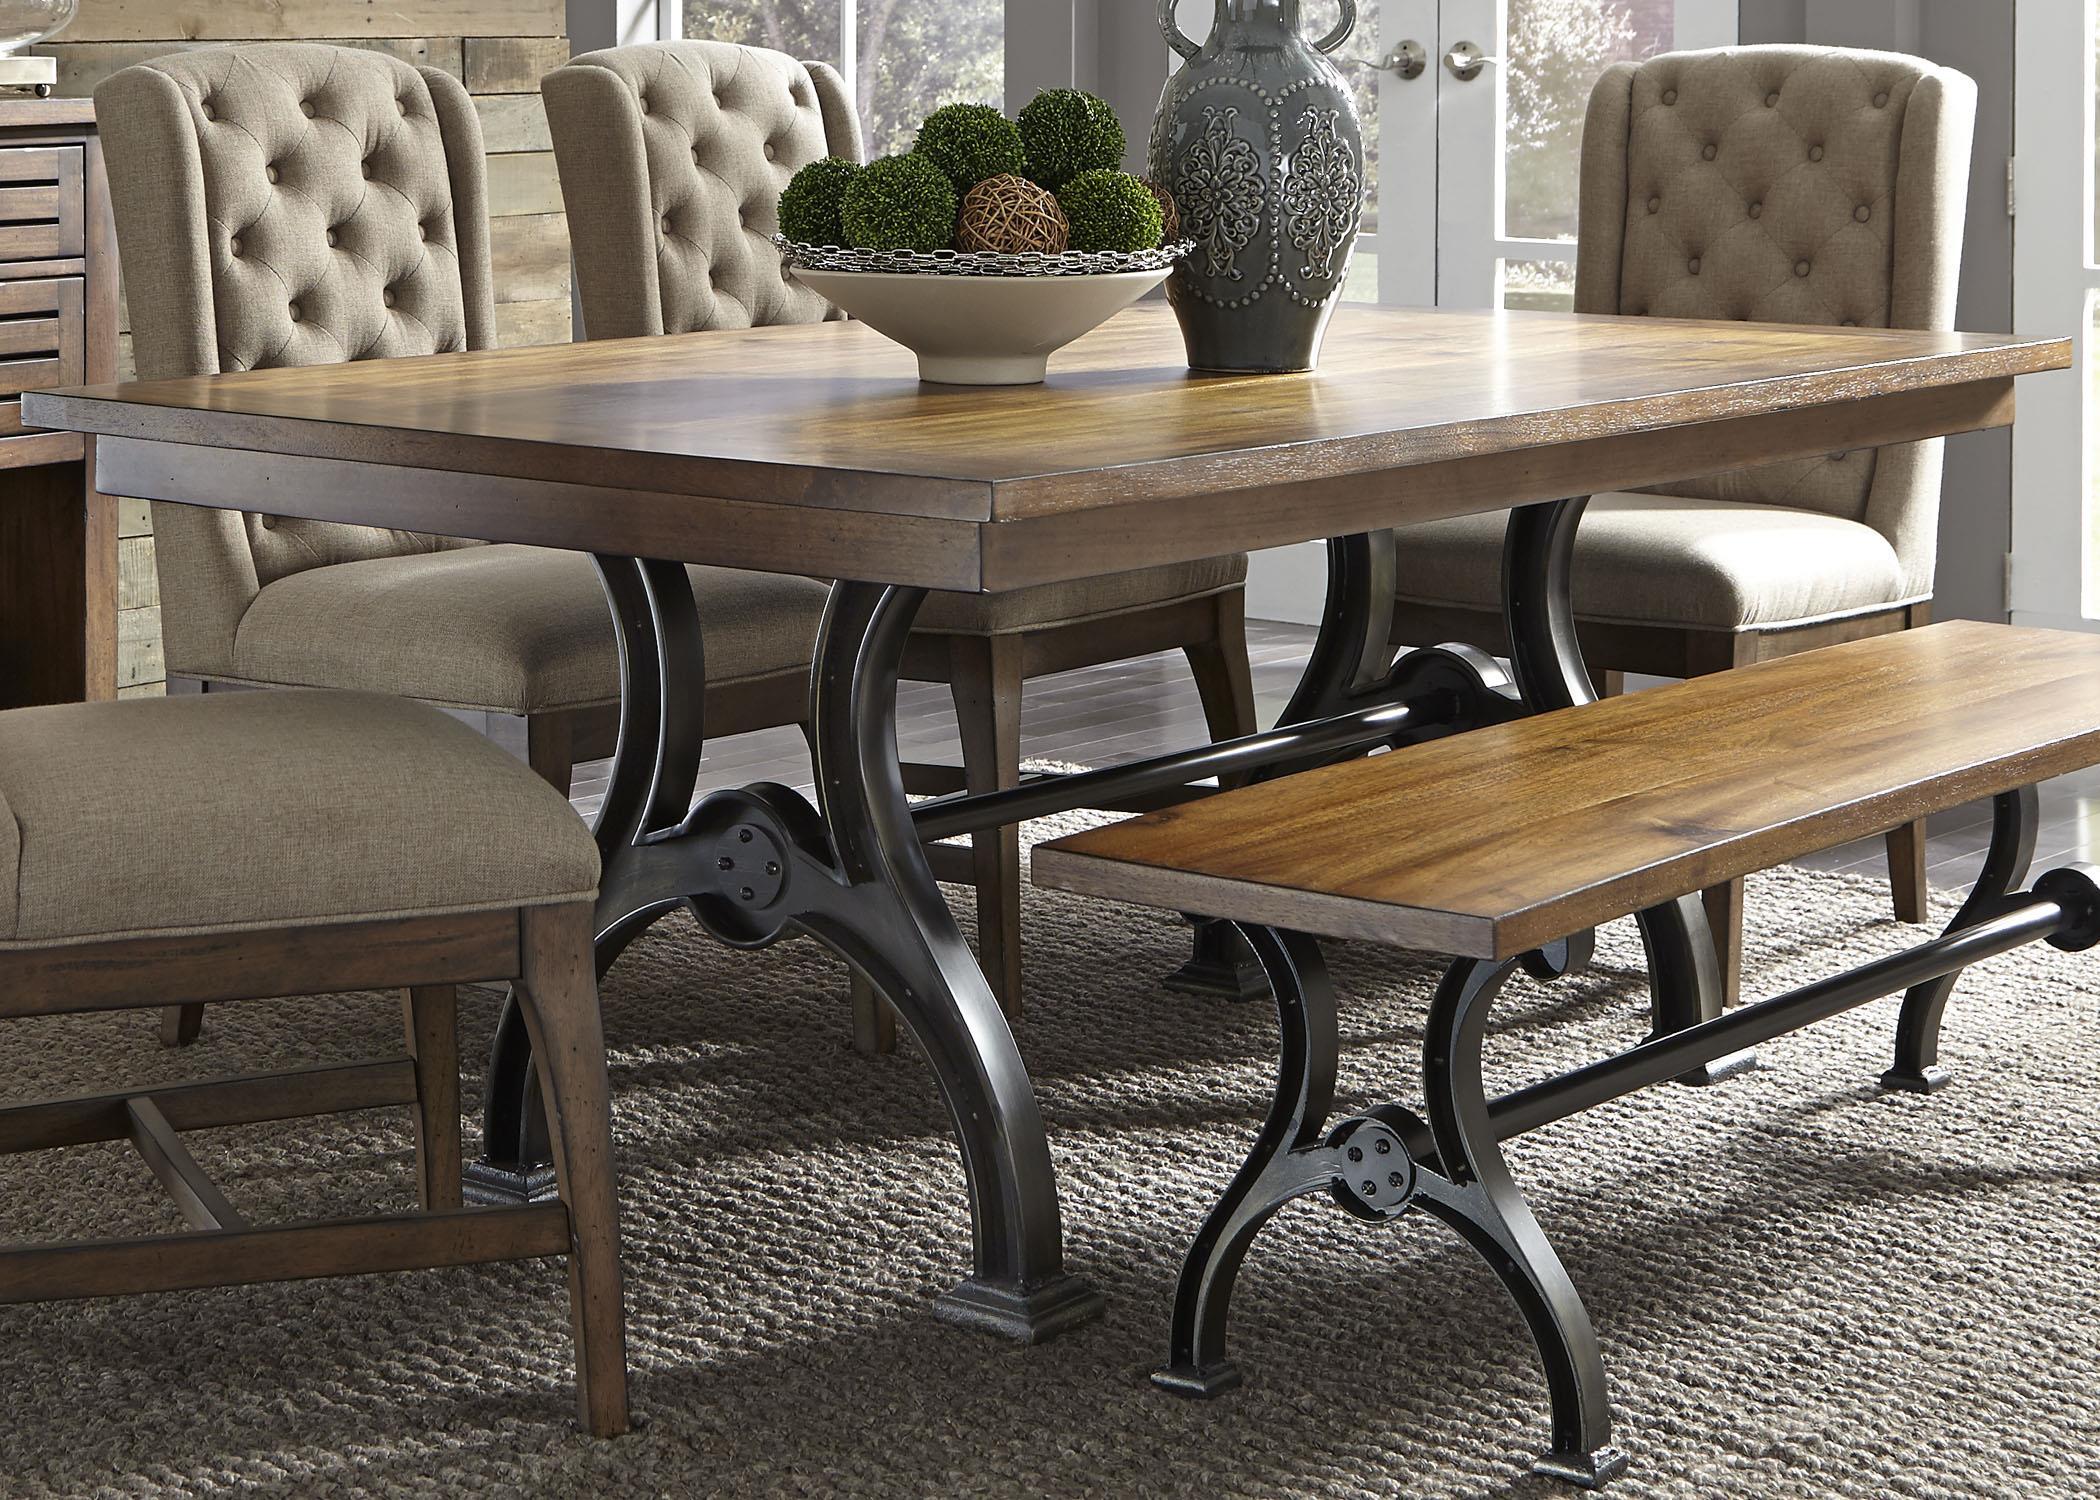 liberty furniture arlington 411 t4274 trestle table with metal base hudson 39 s furniture. Black Bedroom Furniture Sets. Home Design Ideas